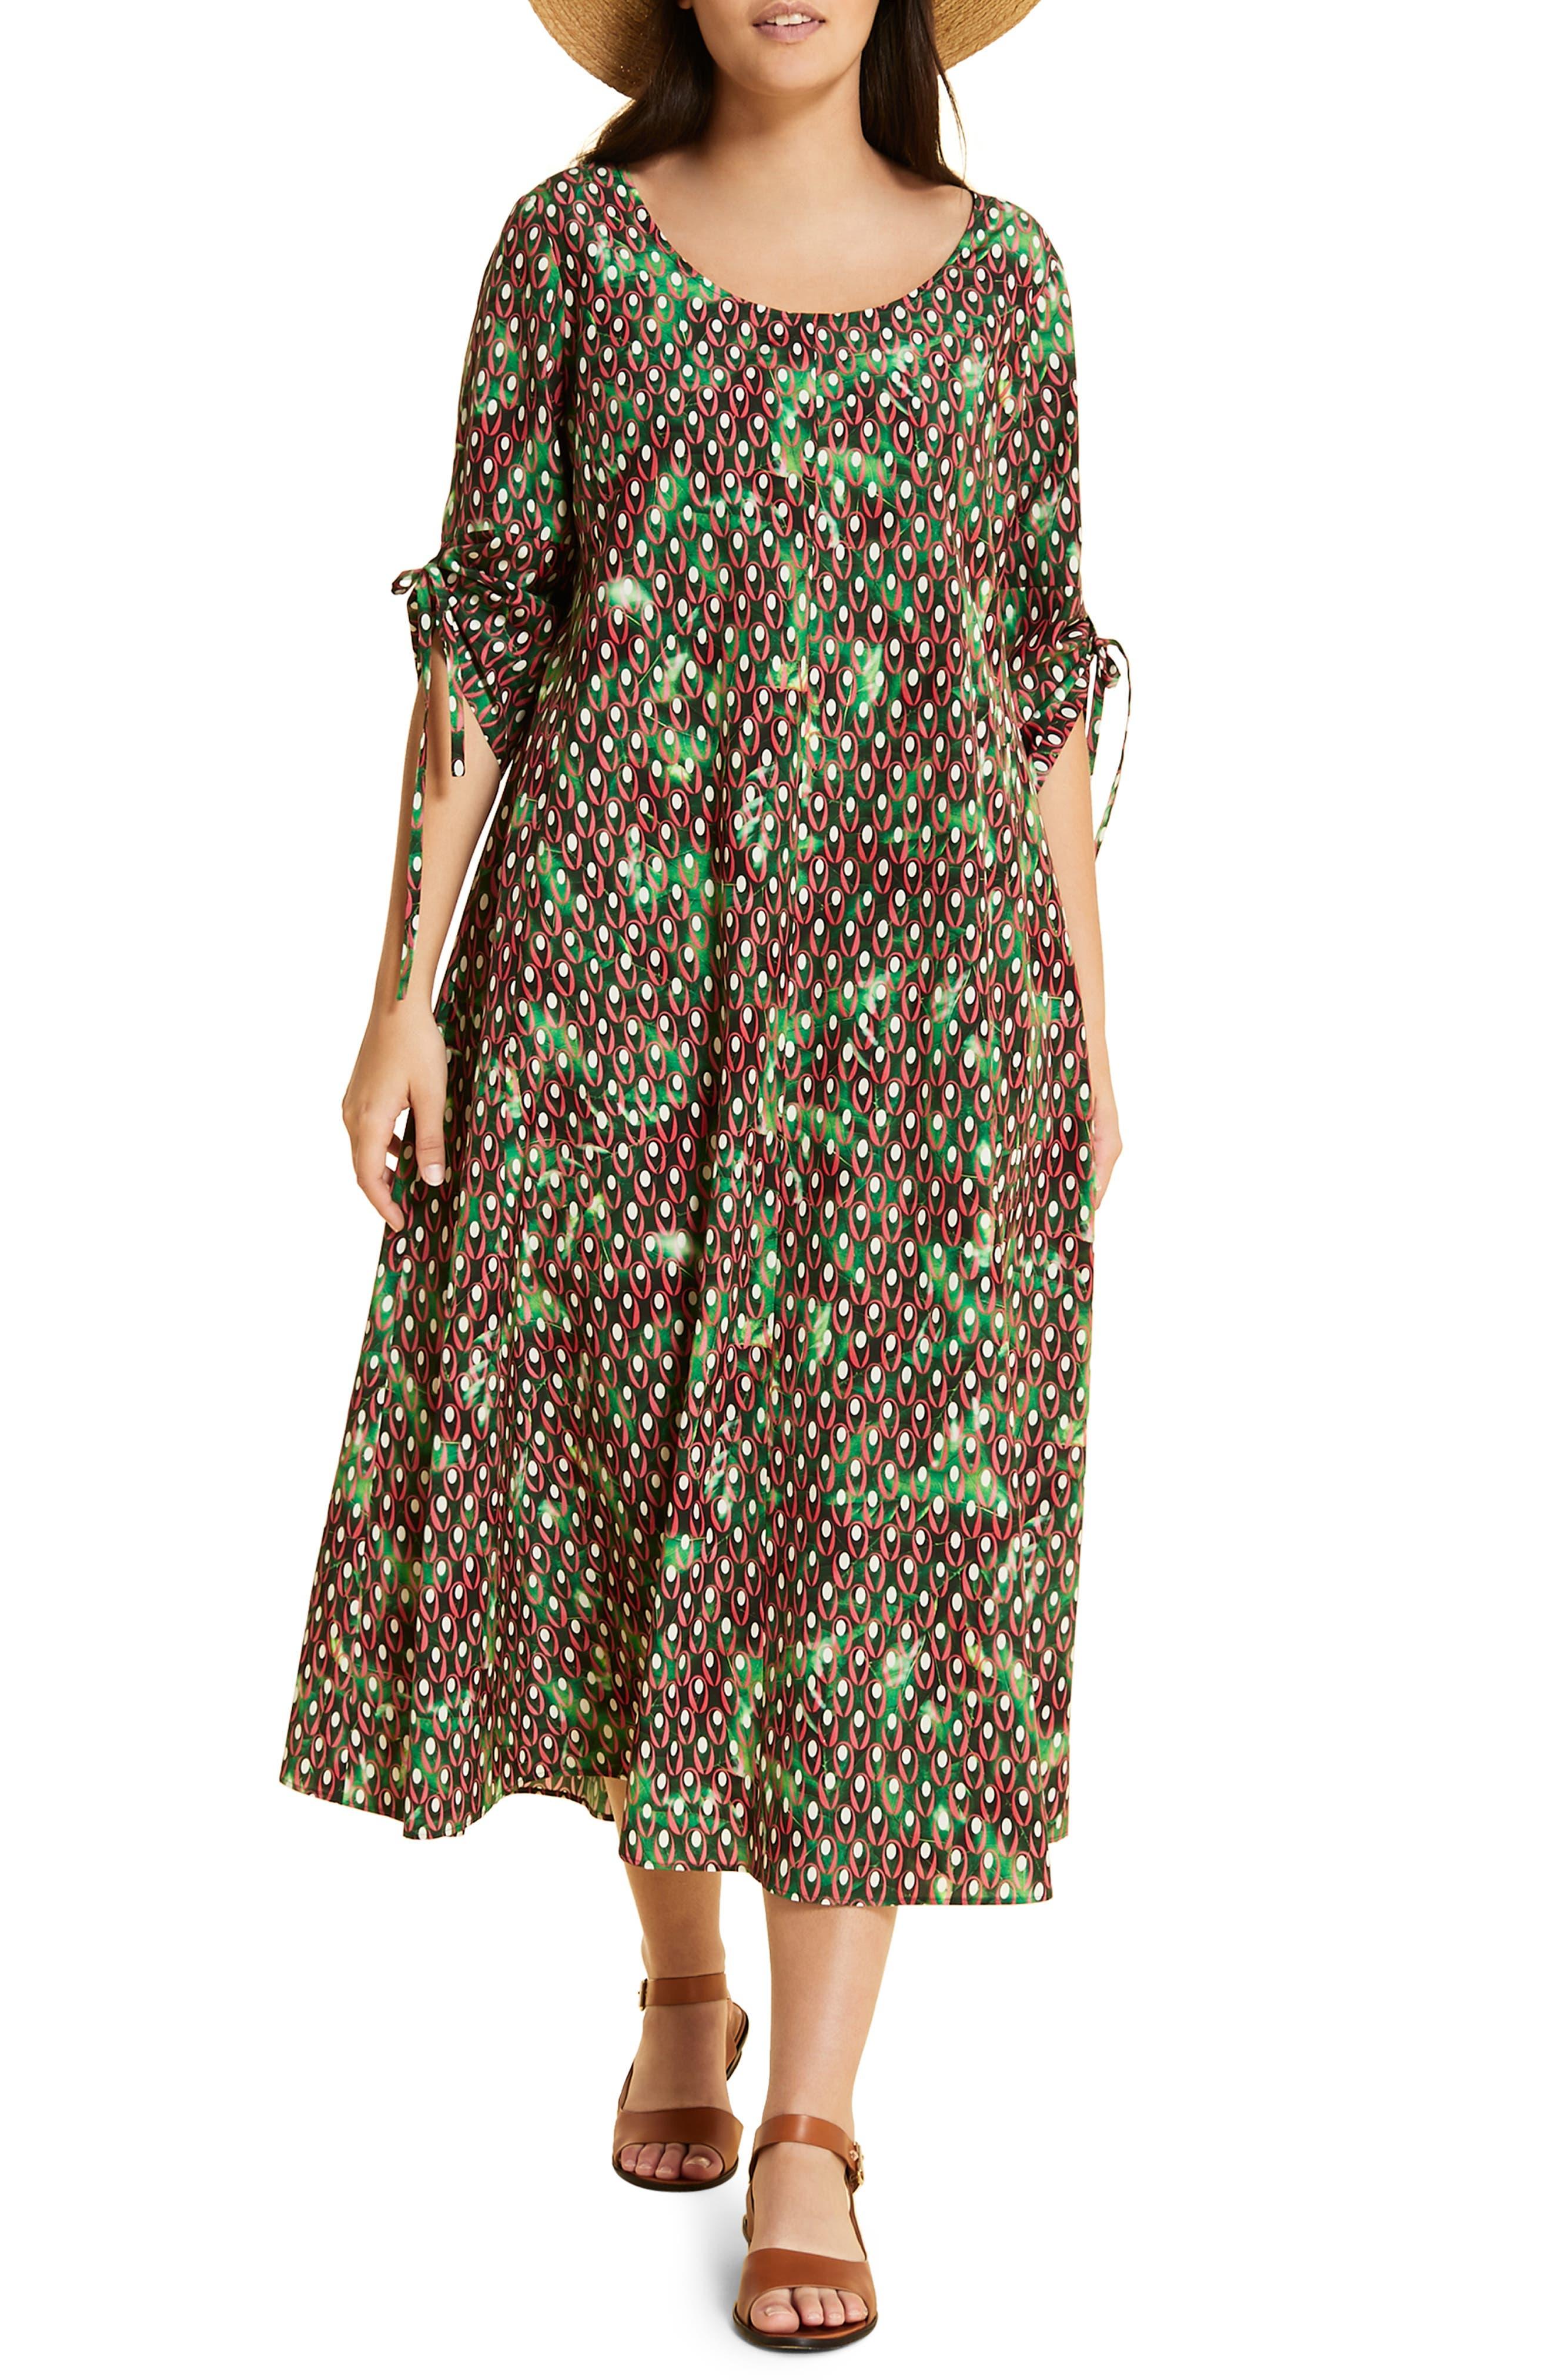 Plus Size Marina Rinaldi Dispensa Ruched Sleeve Cotton Dress, White